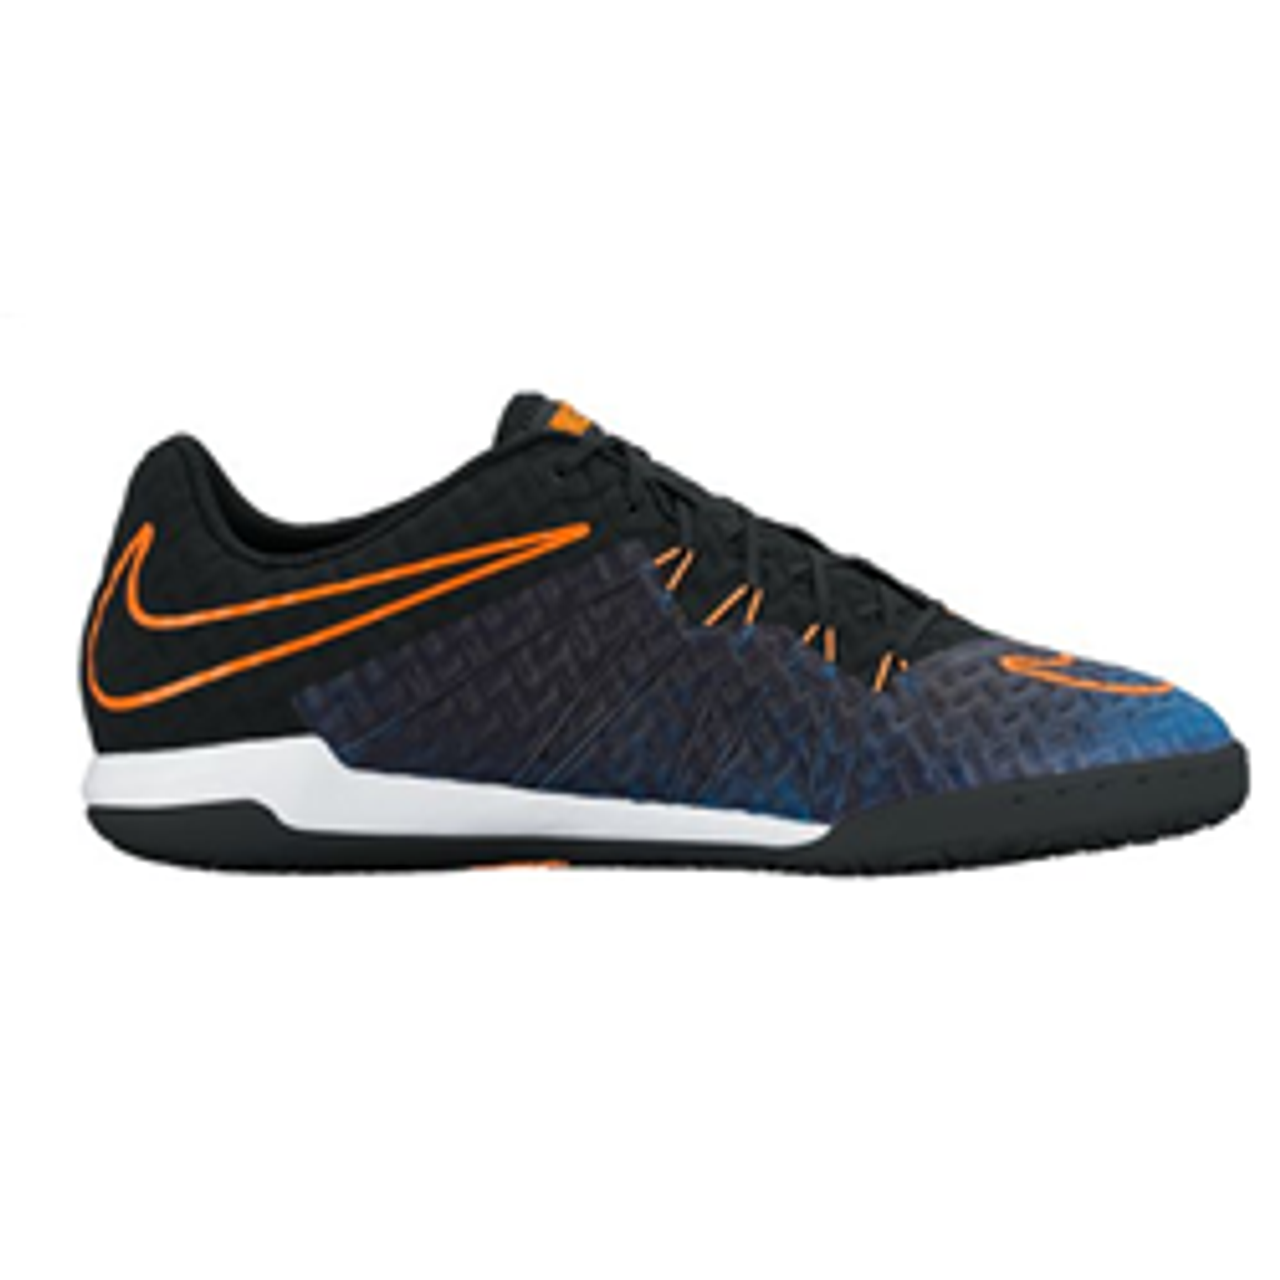 new concept e588f a2464 NIKE HYPERVENOMX FINALE IC indoor soccer shoes black/racer blue